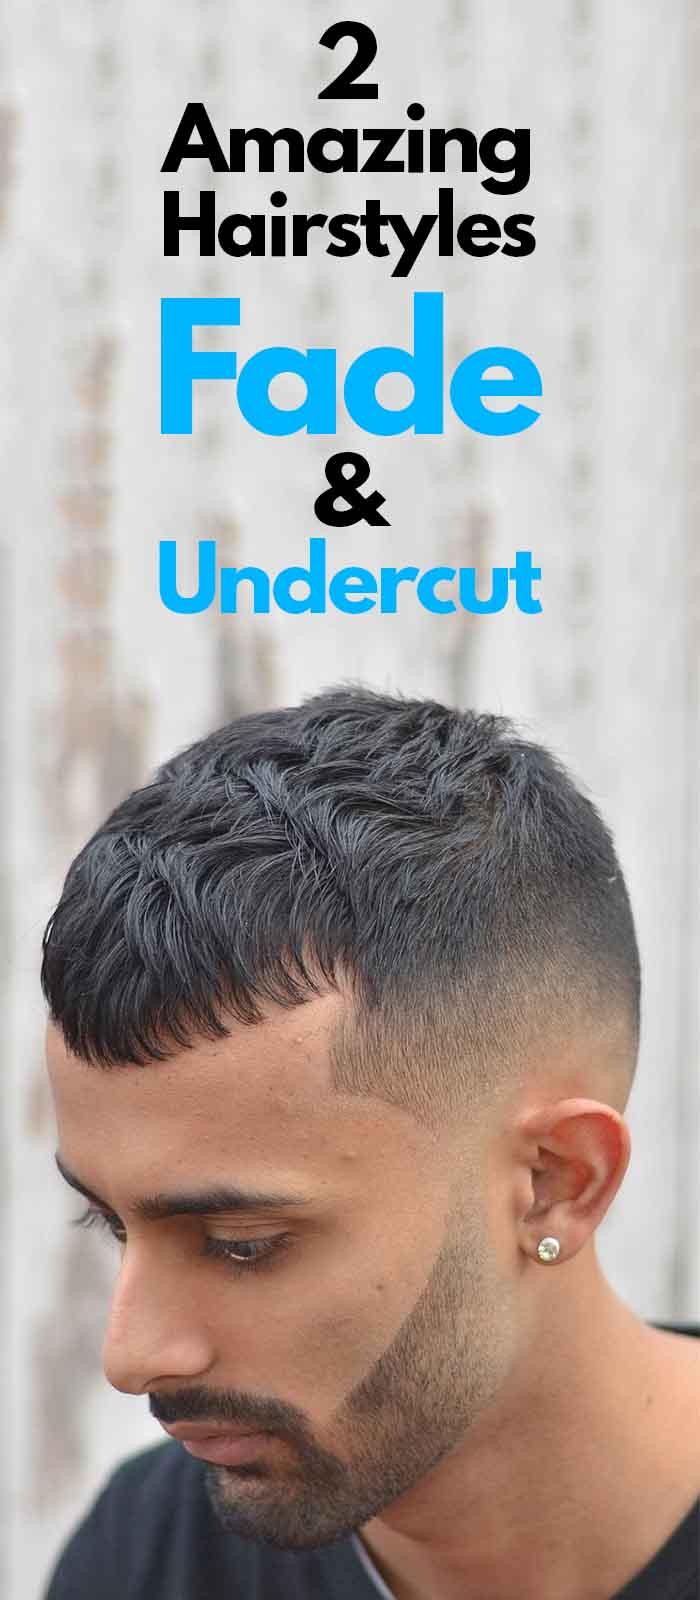 Fade & Undercut Hairstyles 2019